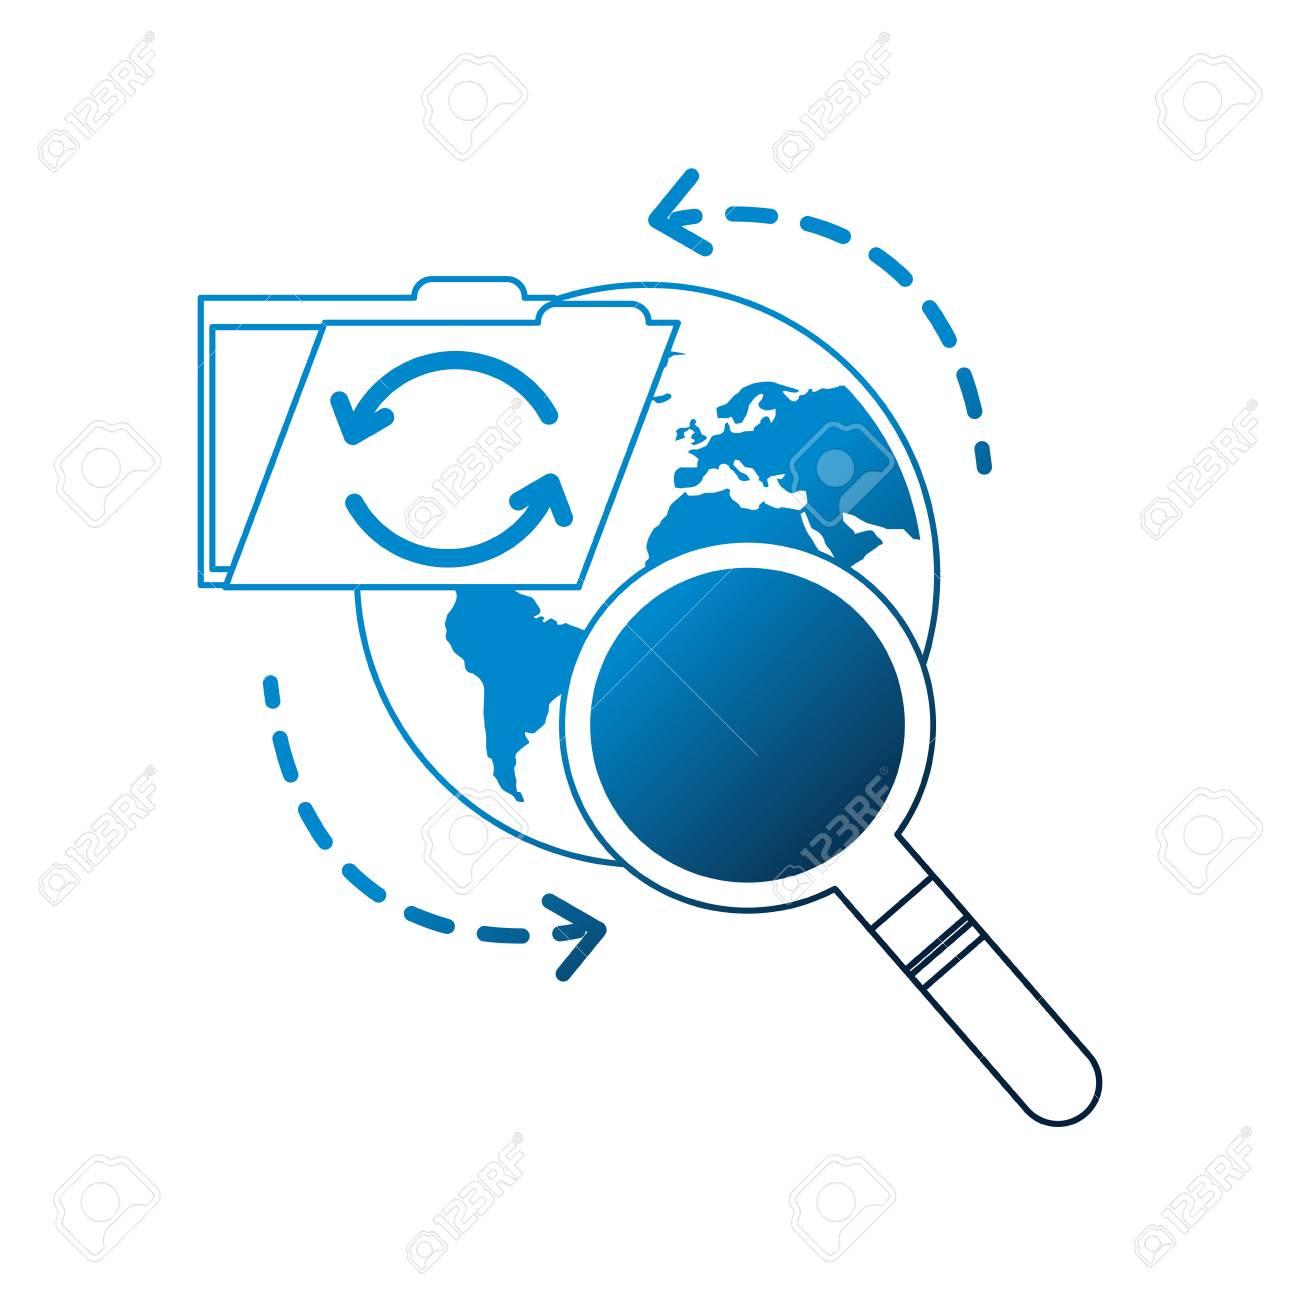 world reload folder file data searching vector illustration neon - 107975975